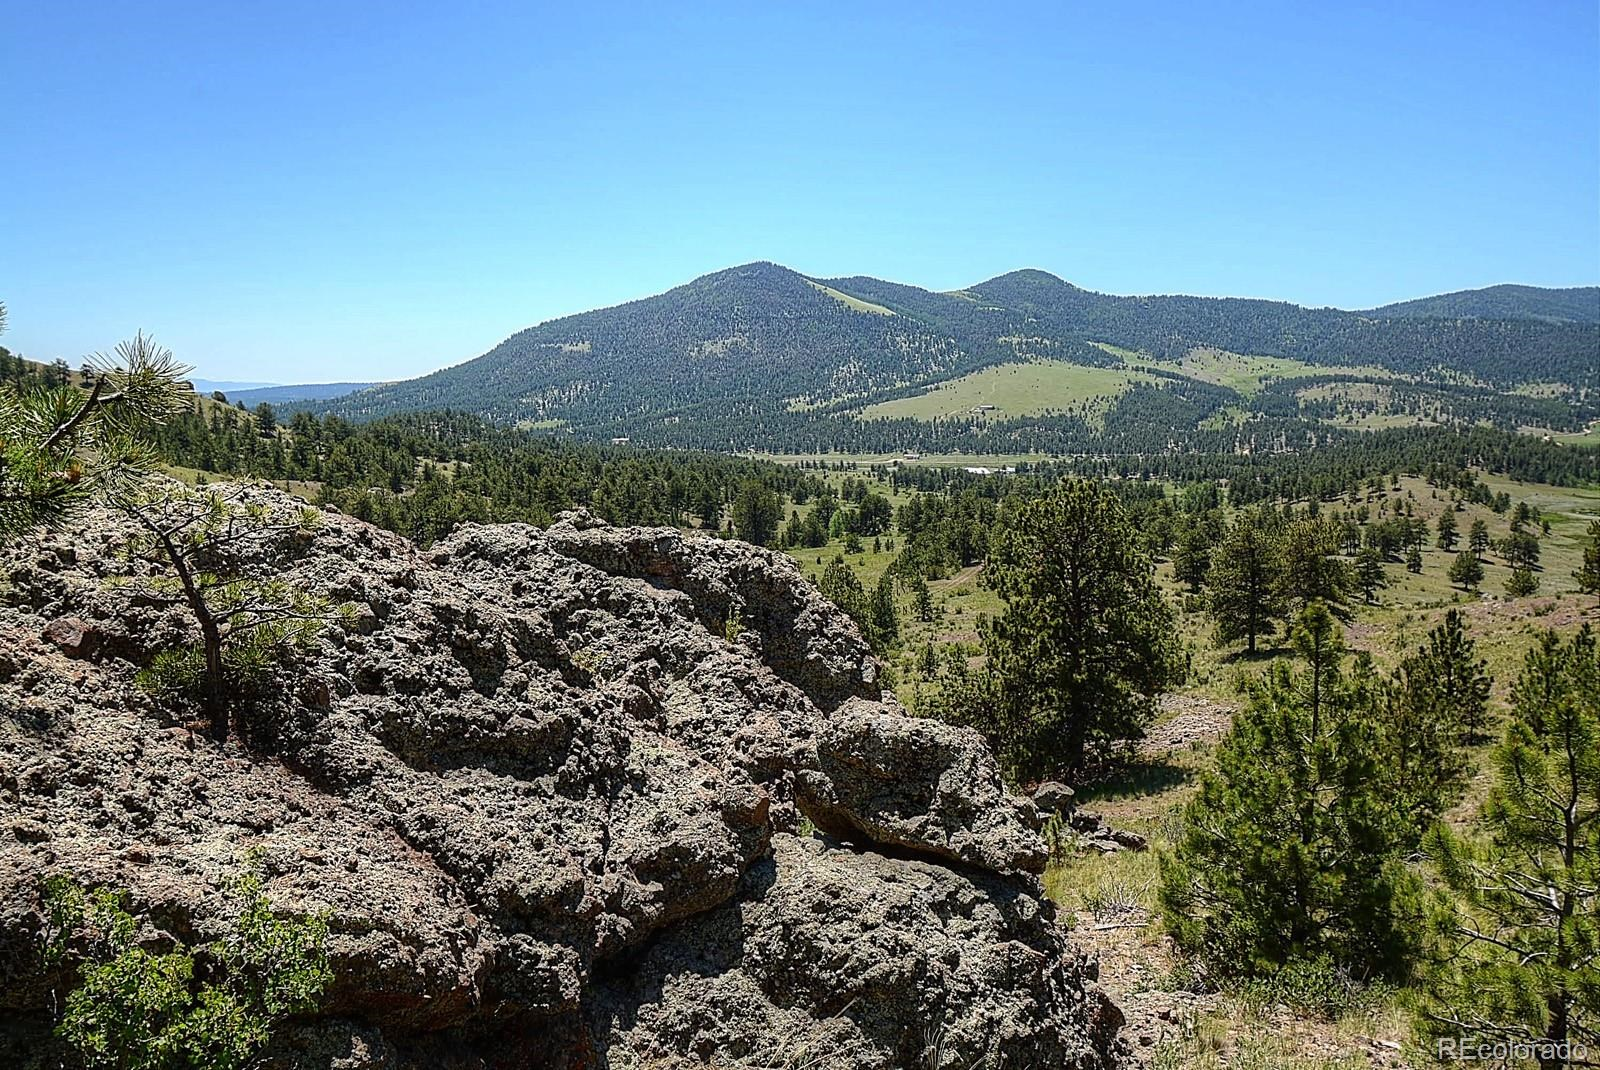 MLS# 8182693 - 34 - 396 Eagle Nest Trail, Guffey, CO 80820